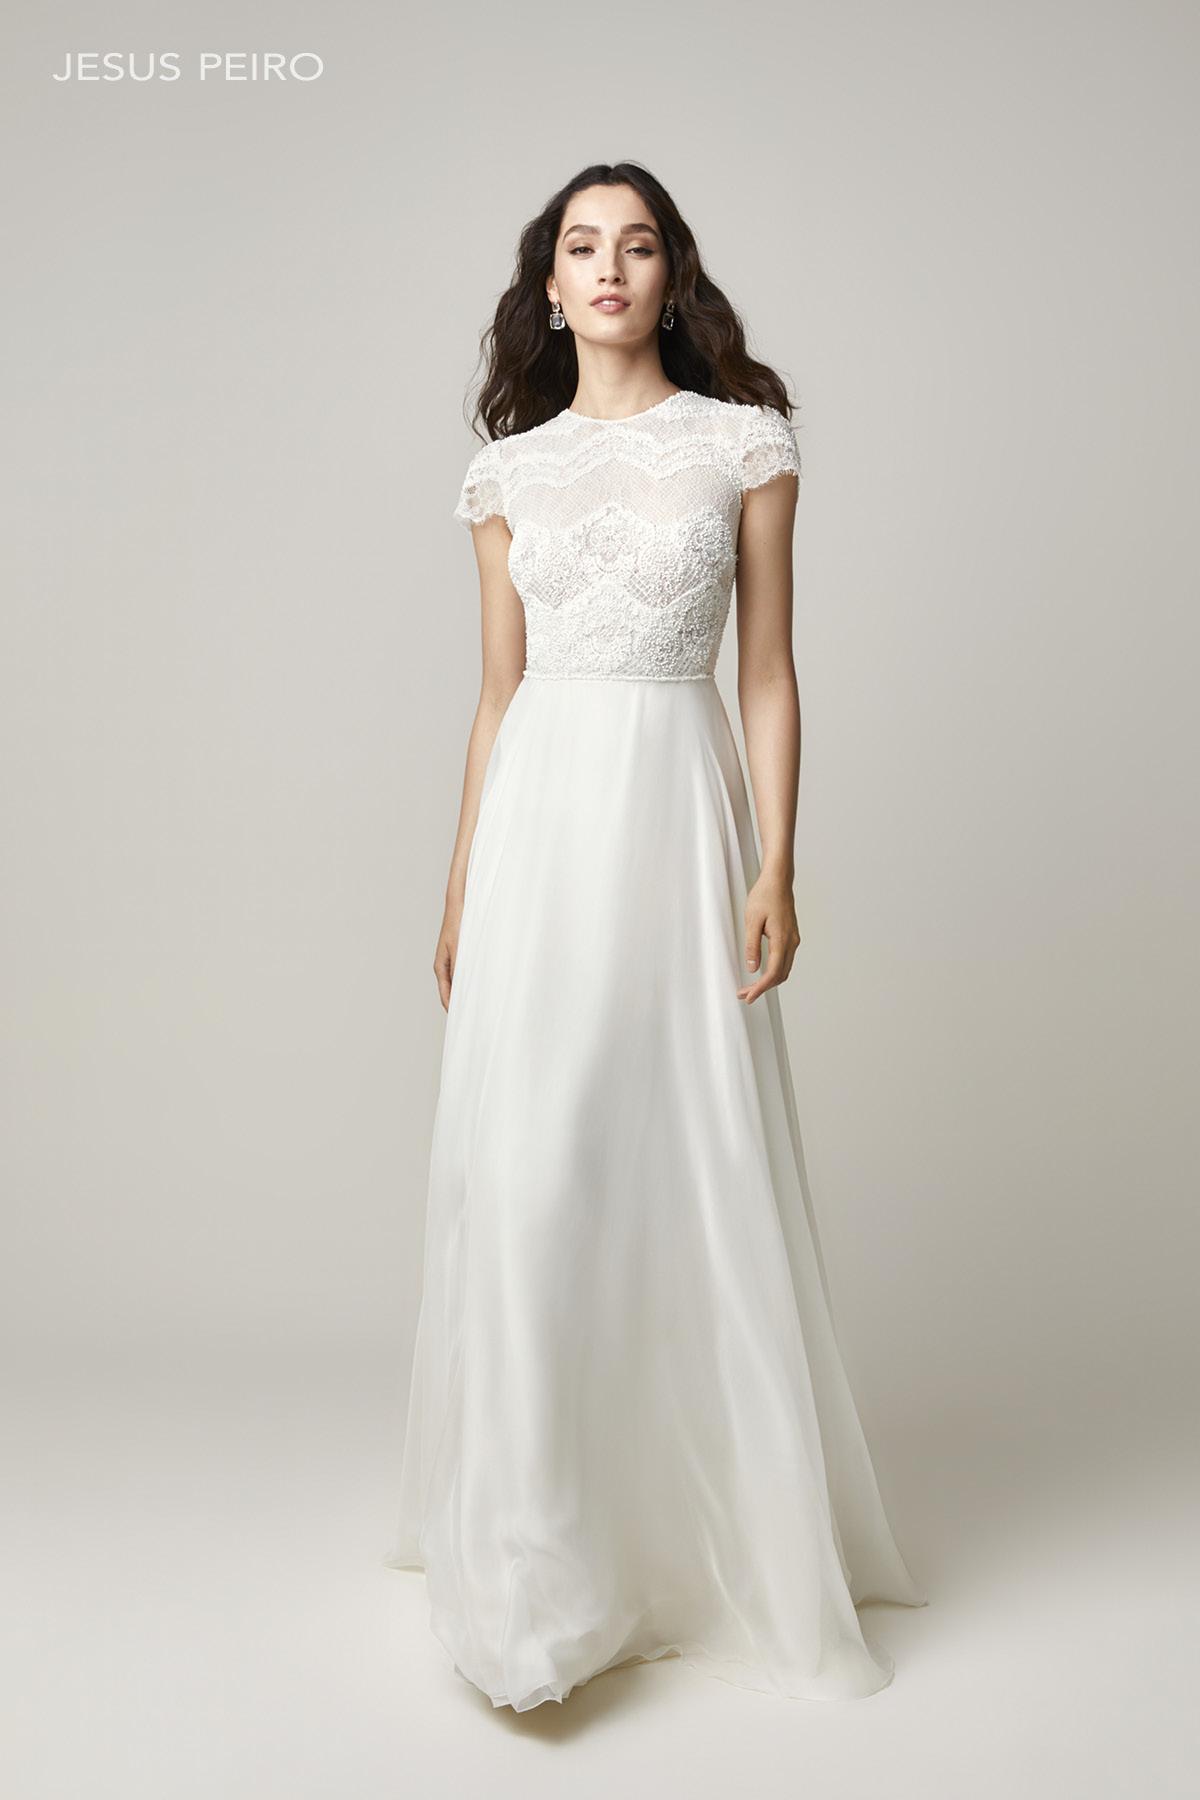 Vestido novia Jesús Peiró Ref.2267